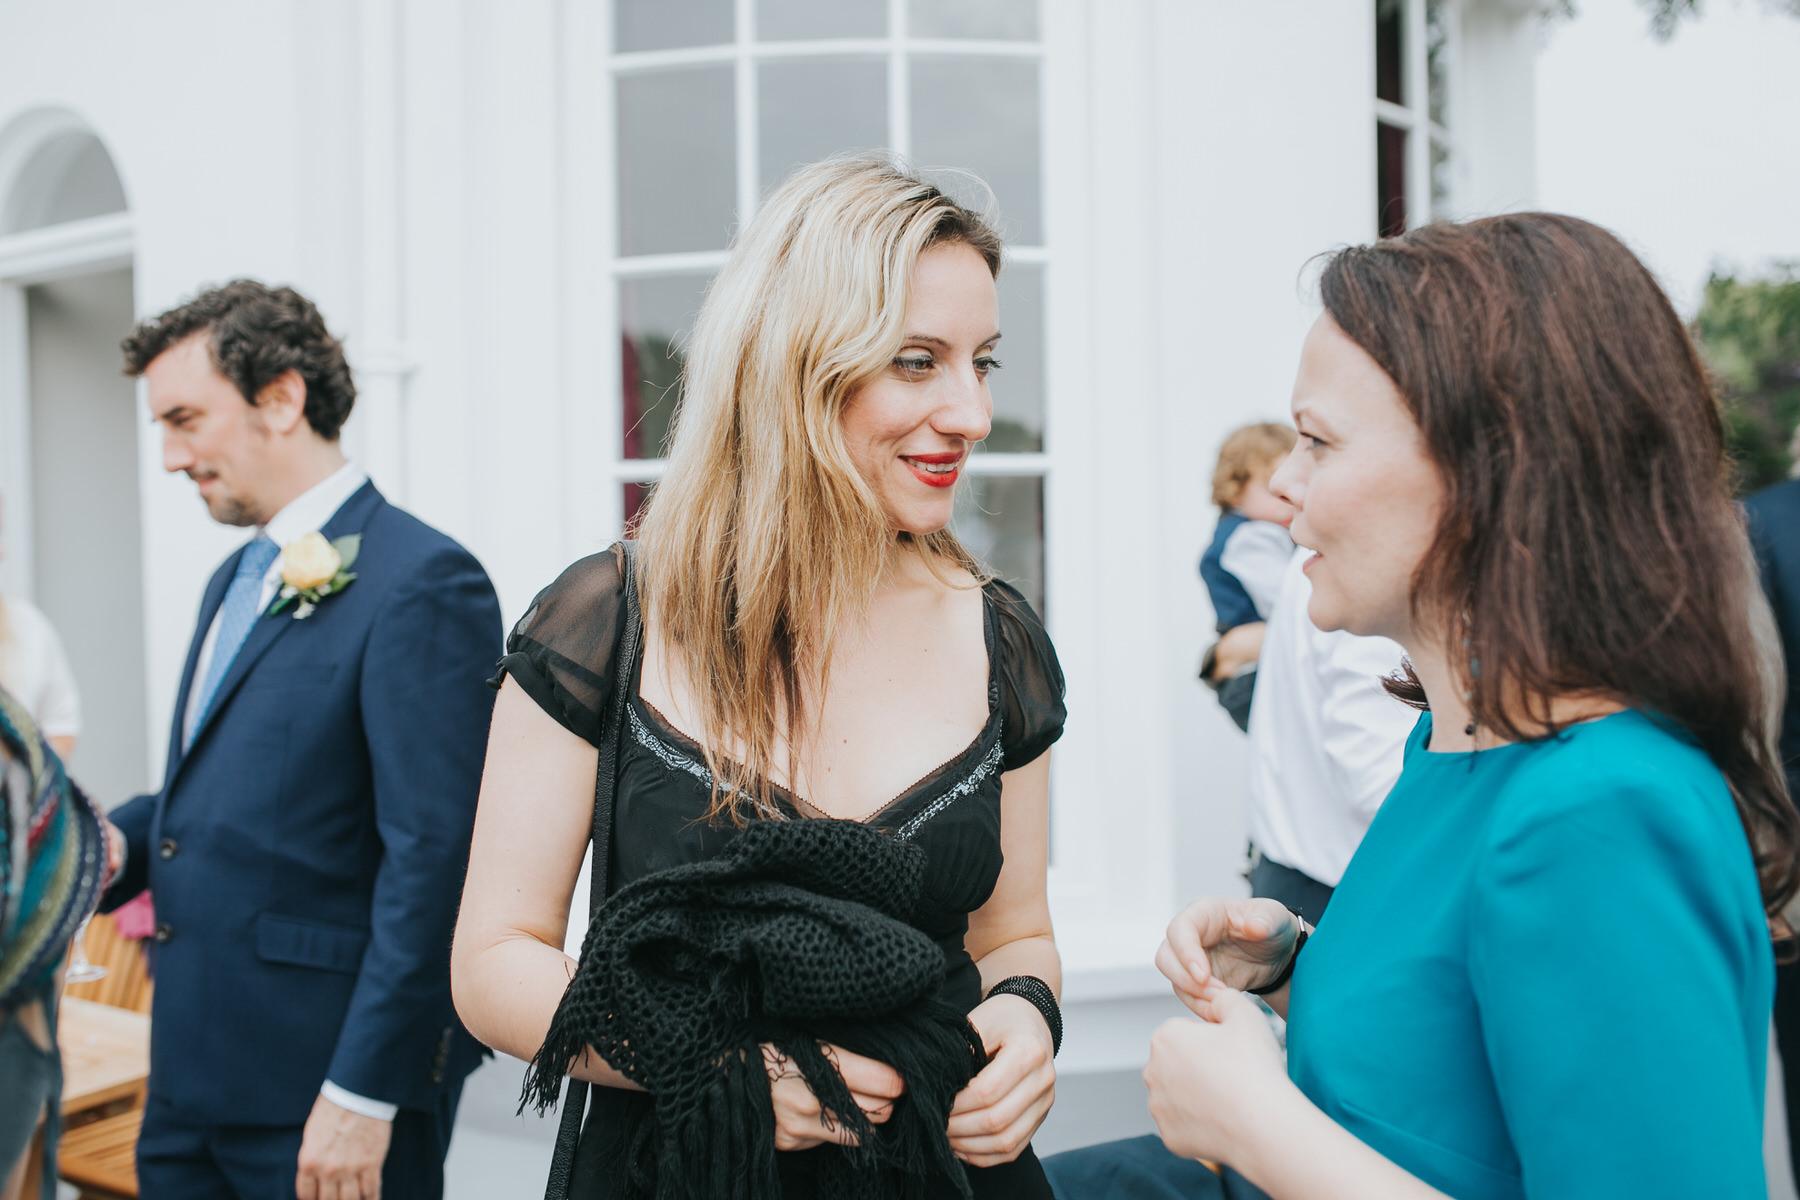 246-Belair House wedding guest reportage.jpg